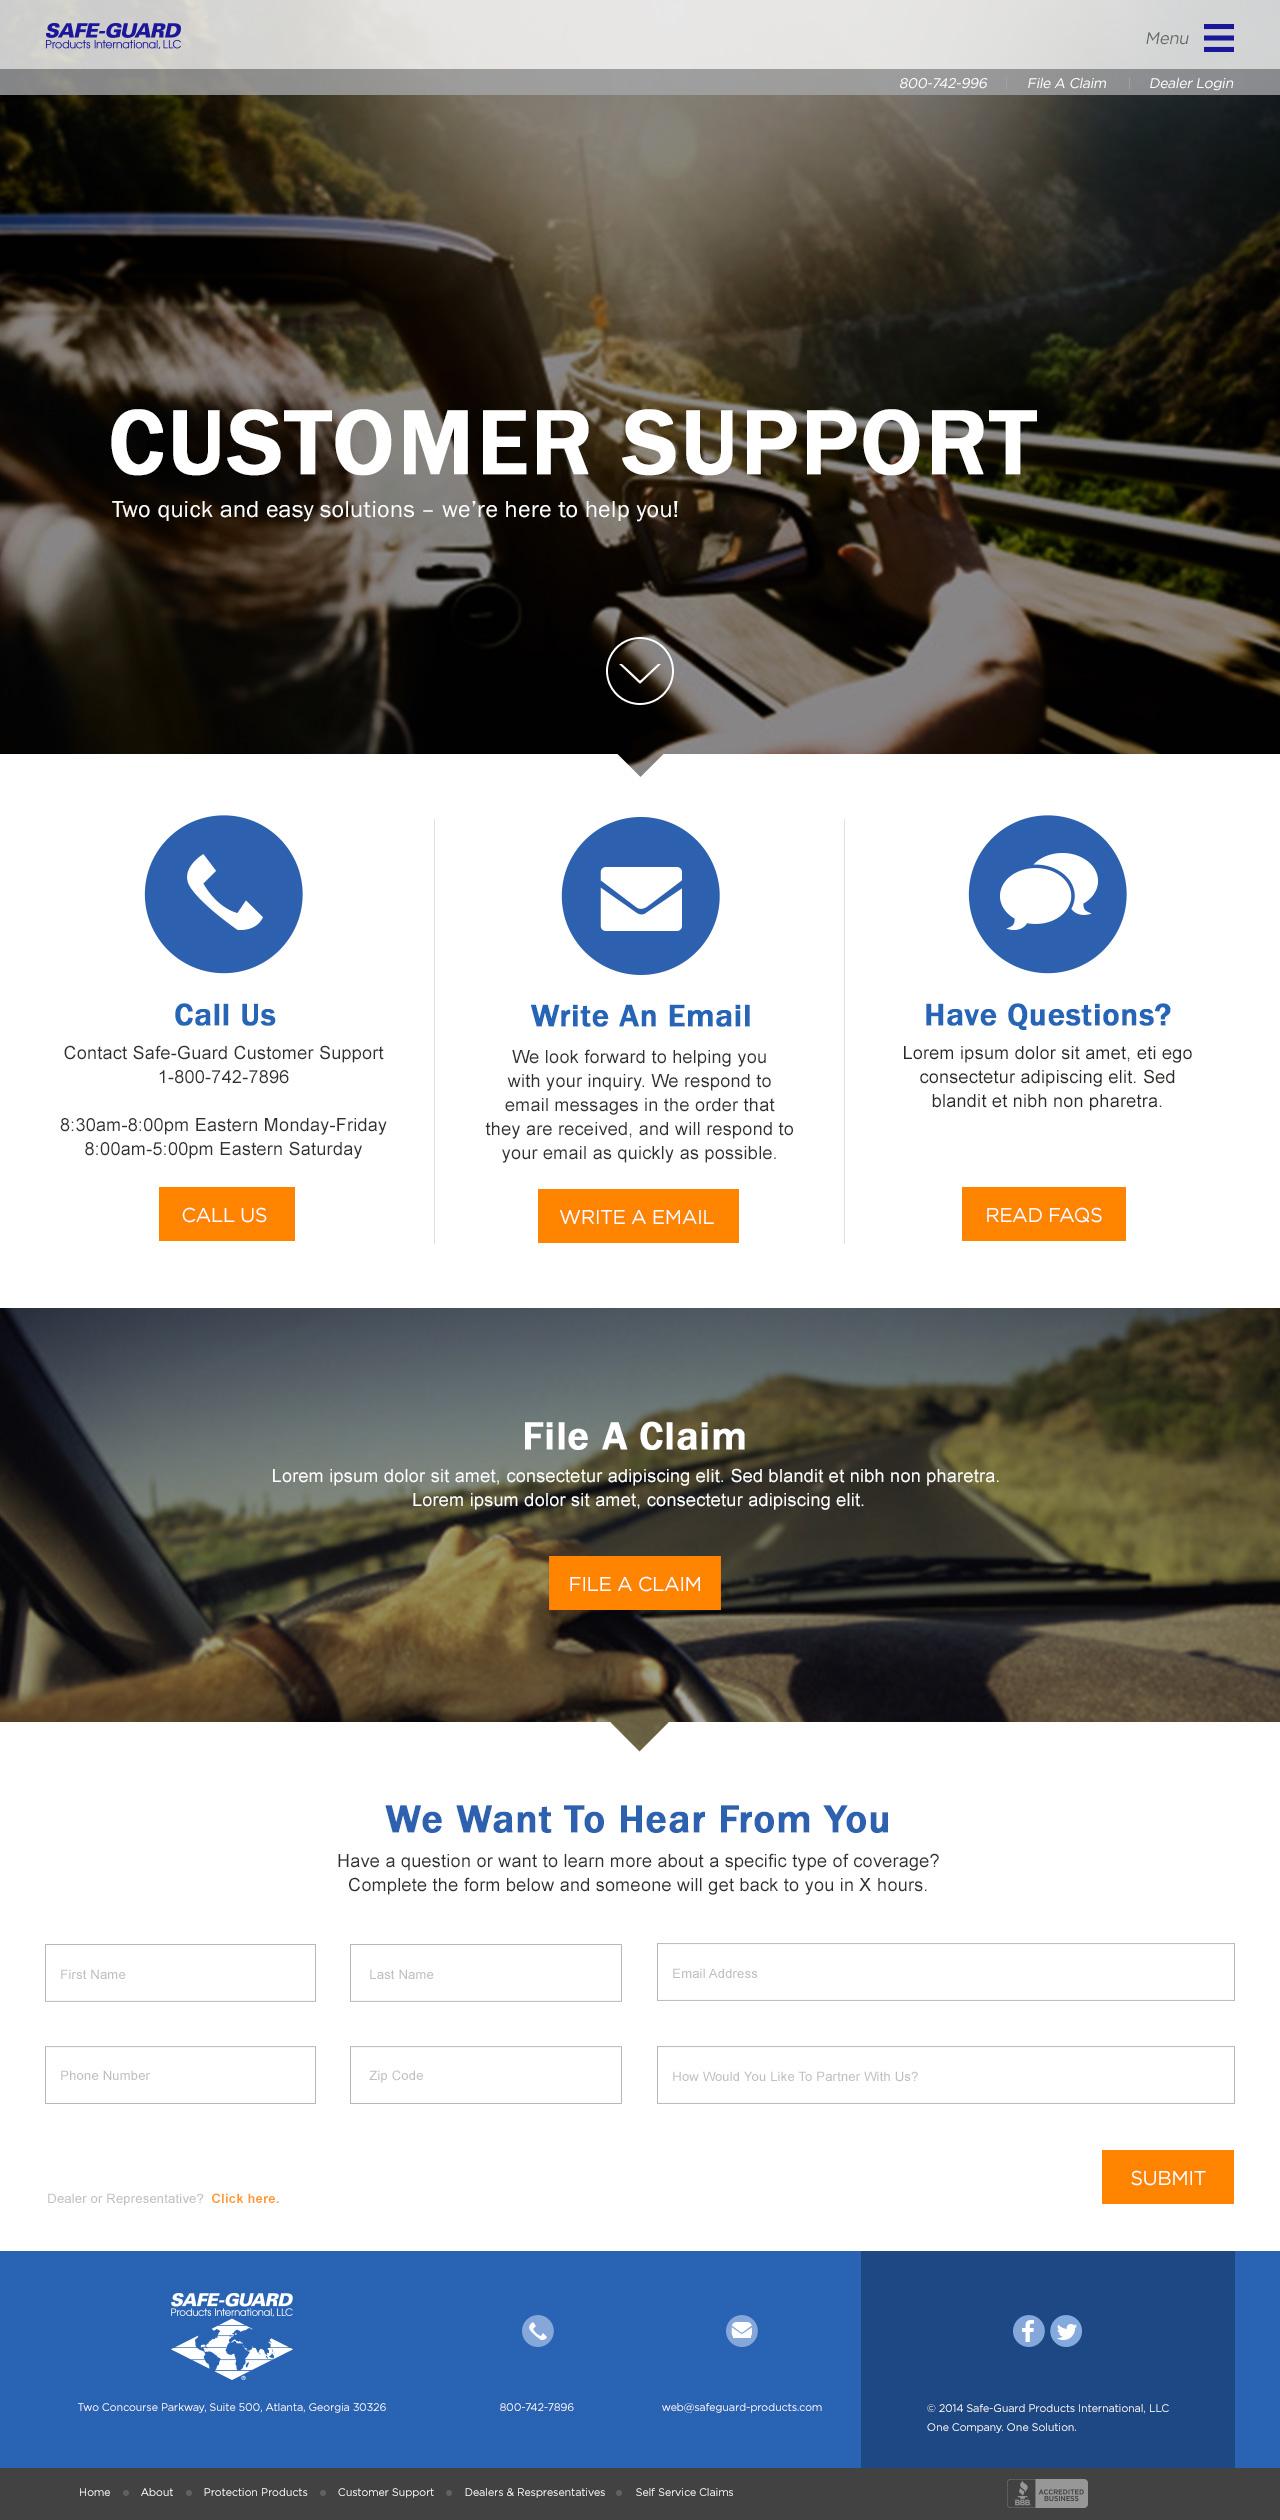 sg_customer-service_desktop.jpg